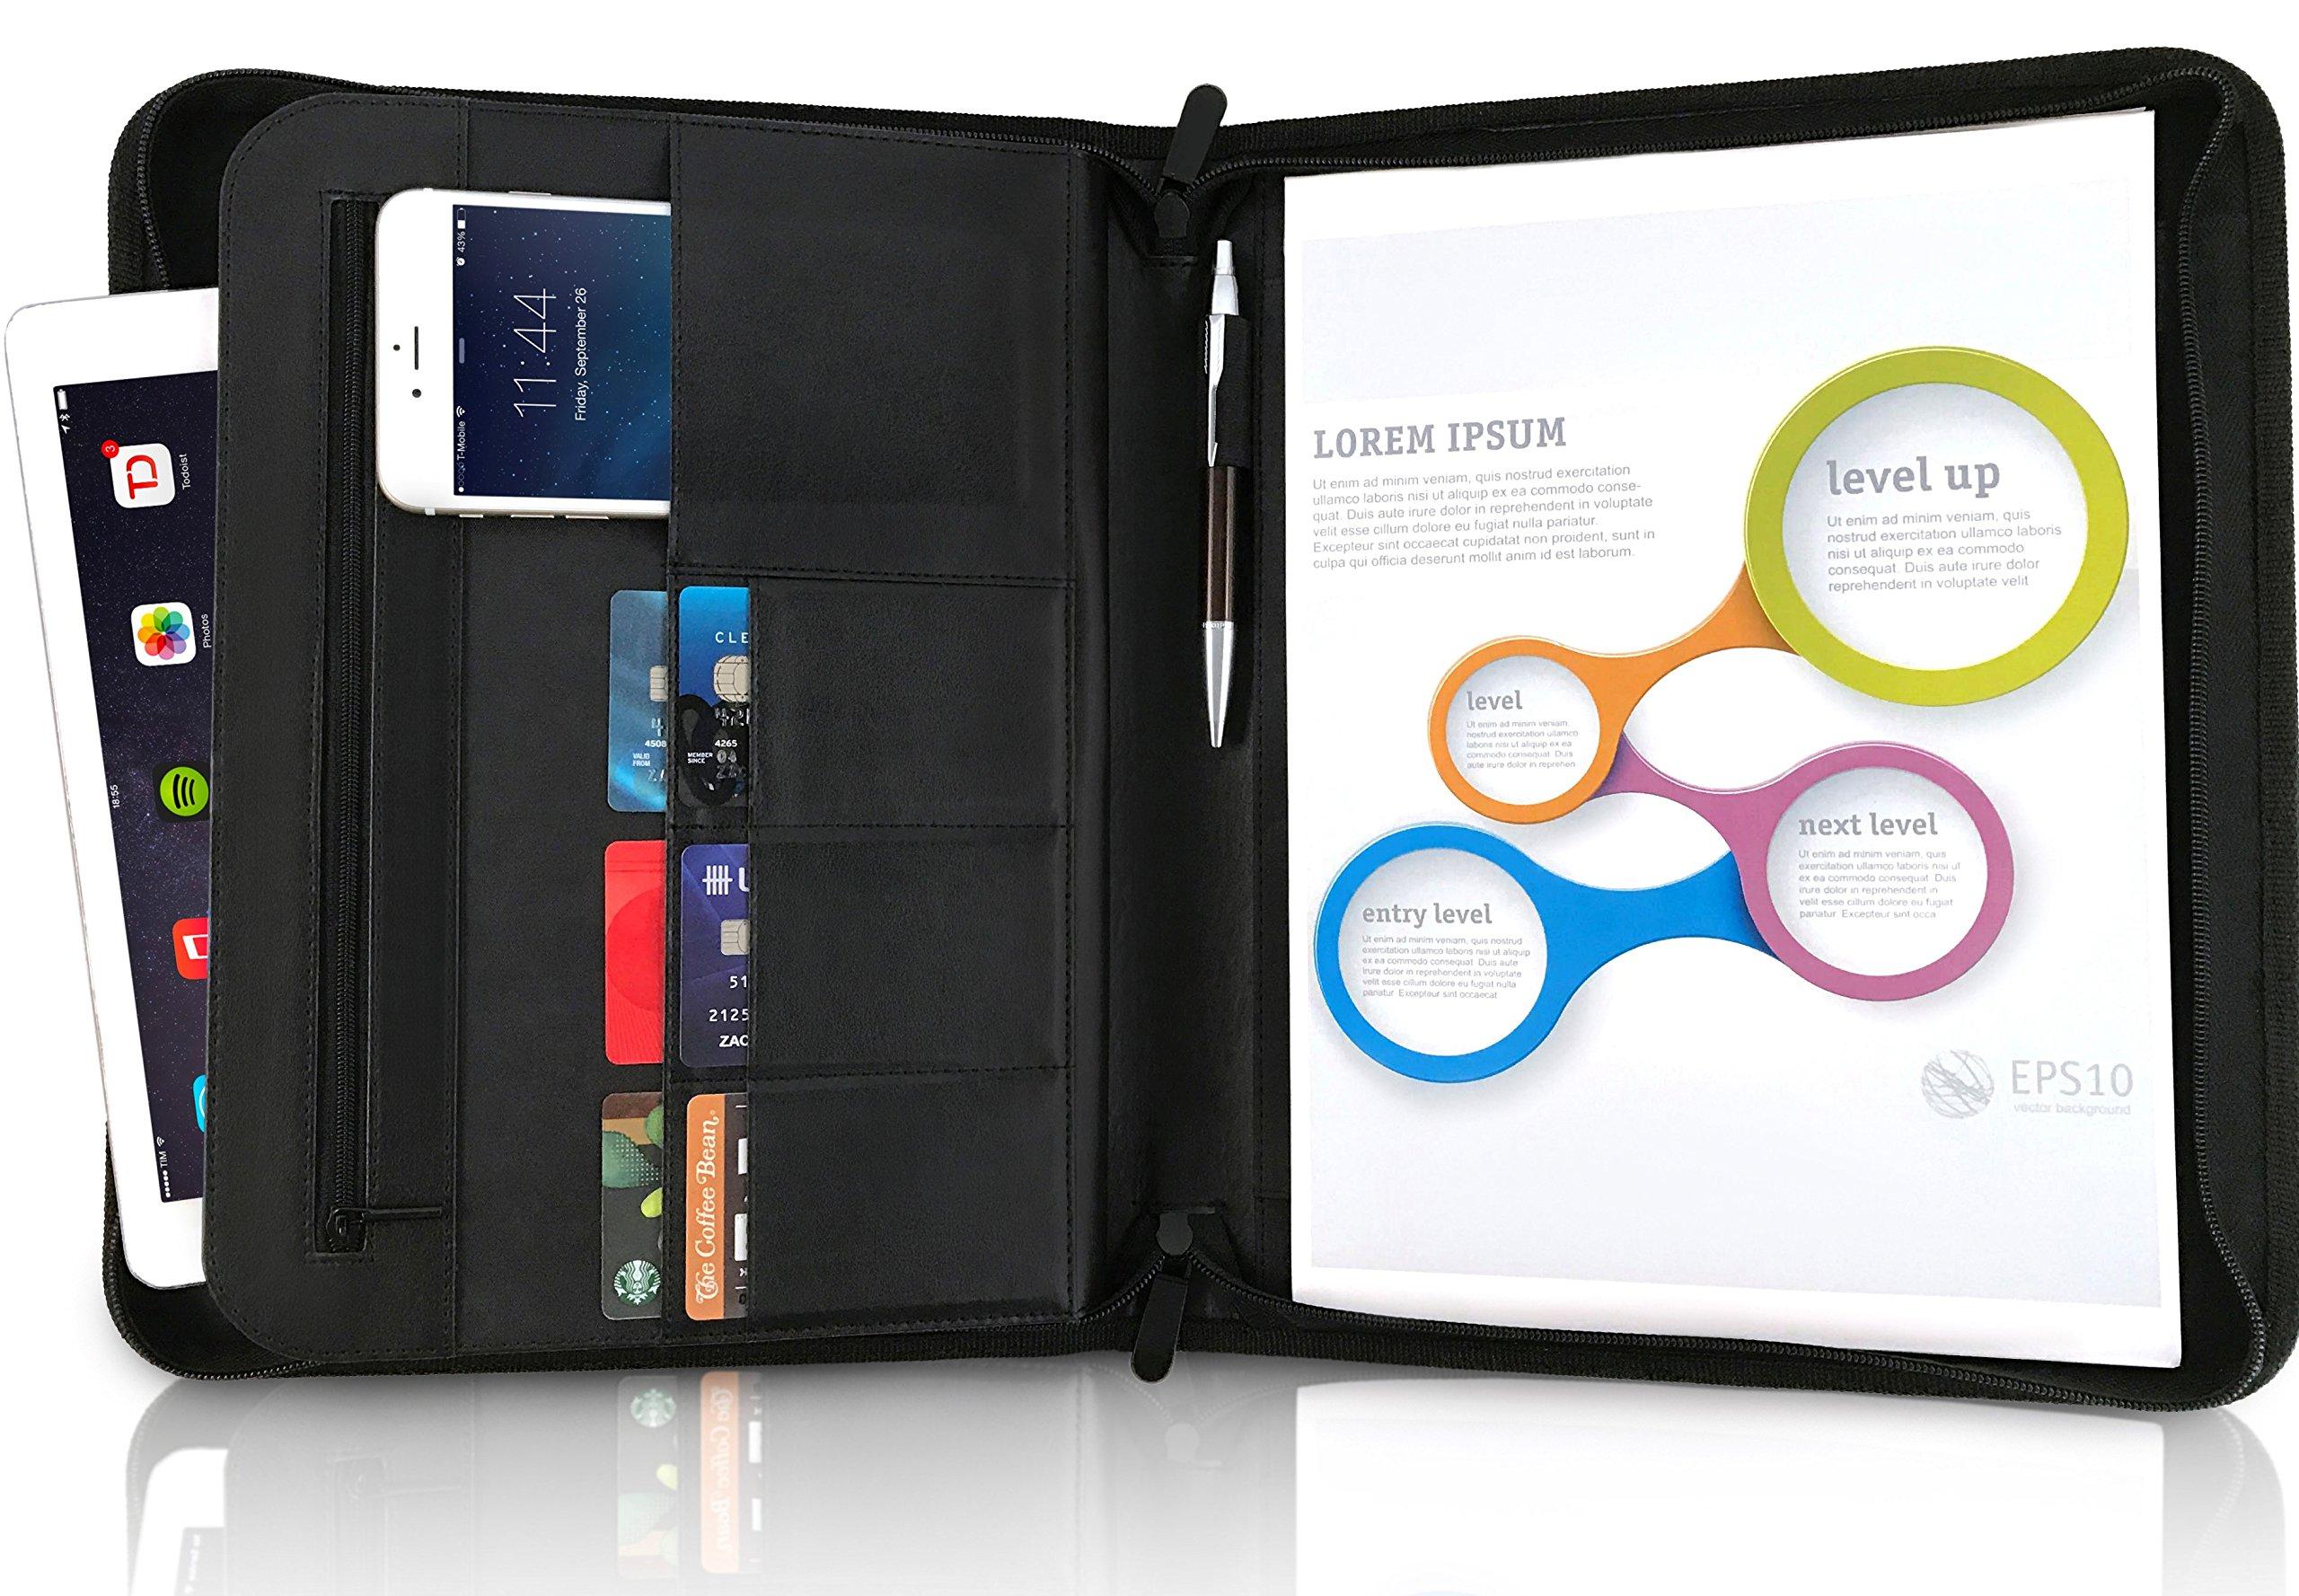 A4 Ringbinder Folder Folio with Zipper – 3 Ring Binder Portfolio Case, File Personal Organizer, Conference Presenter, CV, Art Document Paper Travel Folders, Faux Leather Slim Office Notepad Zip Holder